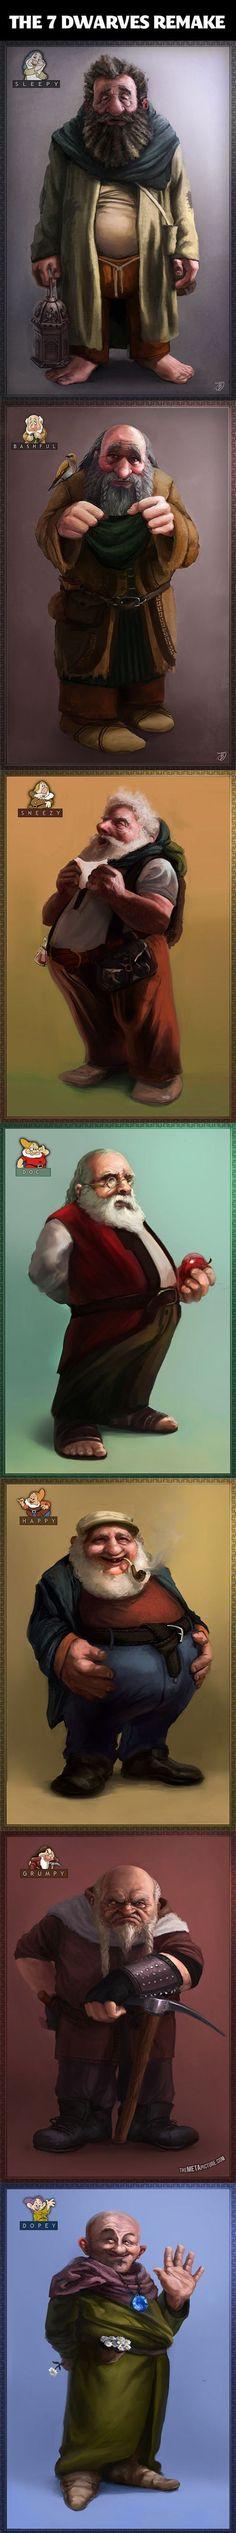 realistic 7 dwarfs